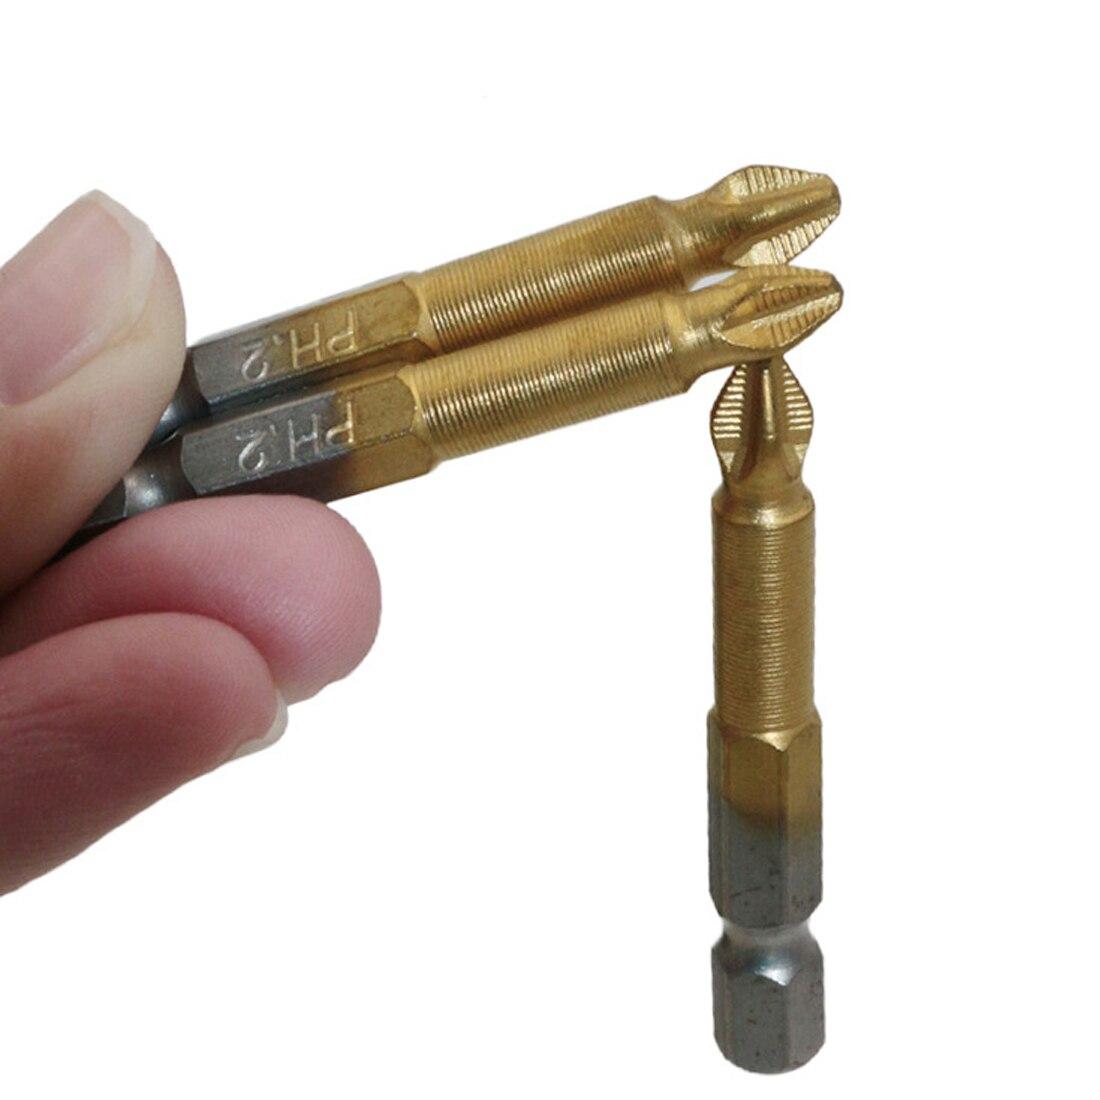 High Quality 5Pcs Anti Slip Electric Screwdriver Bits Single Side Magnetic Hex Shank PH2 50mm